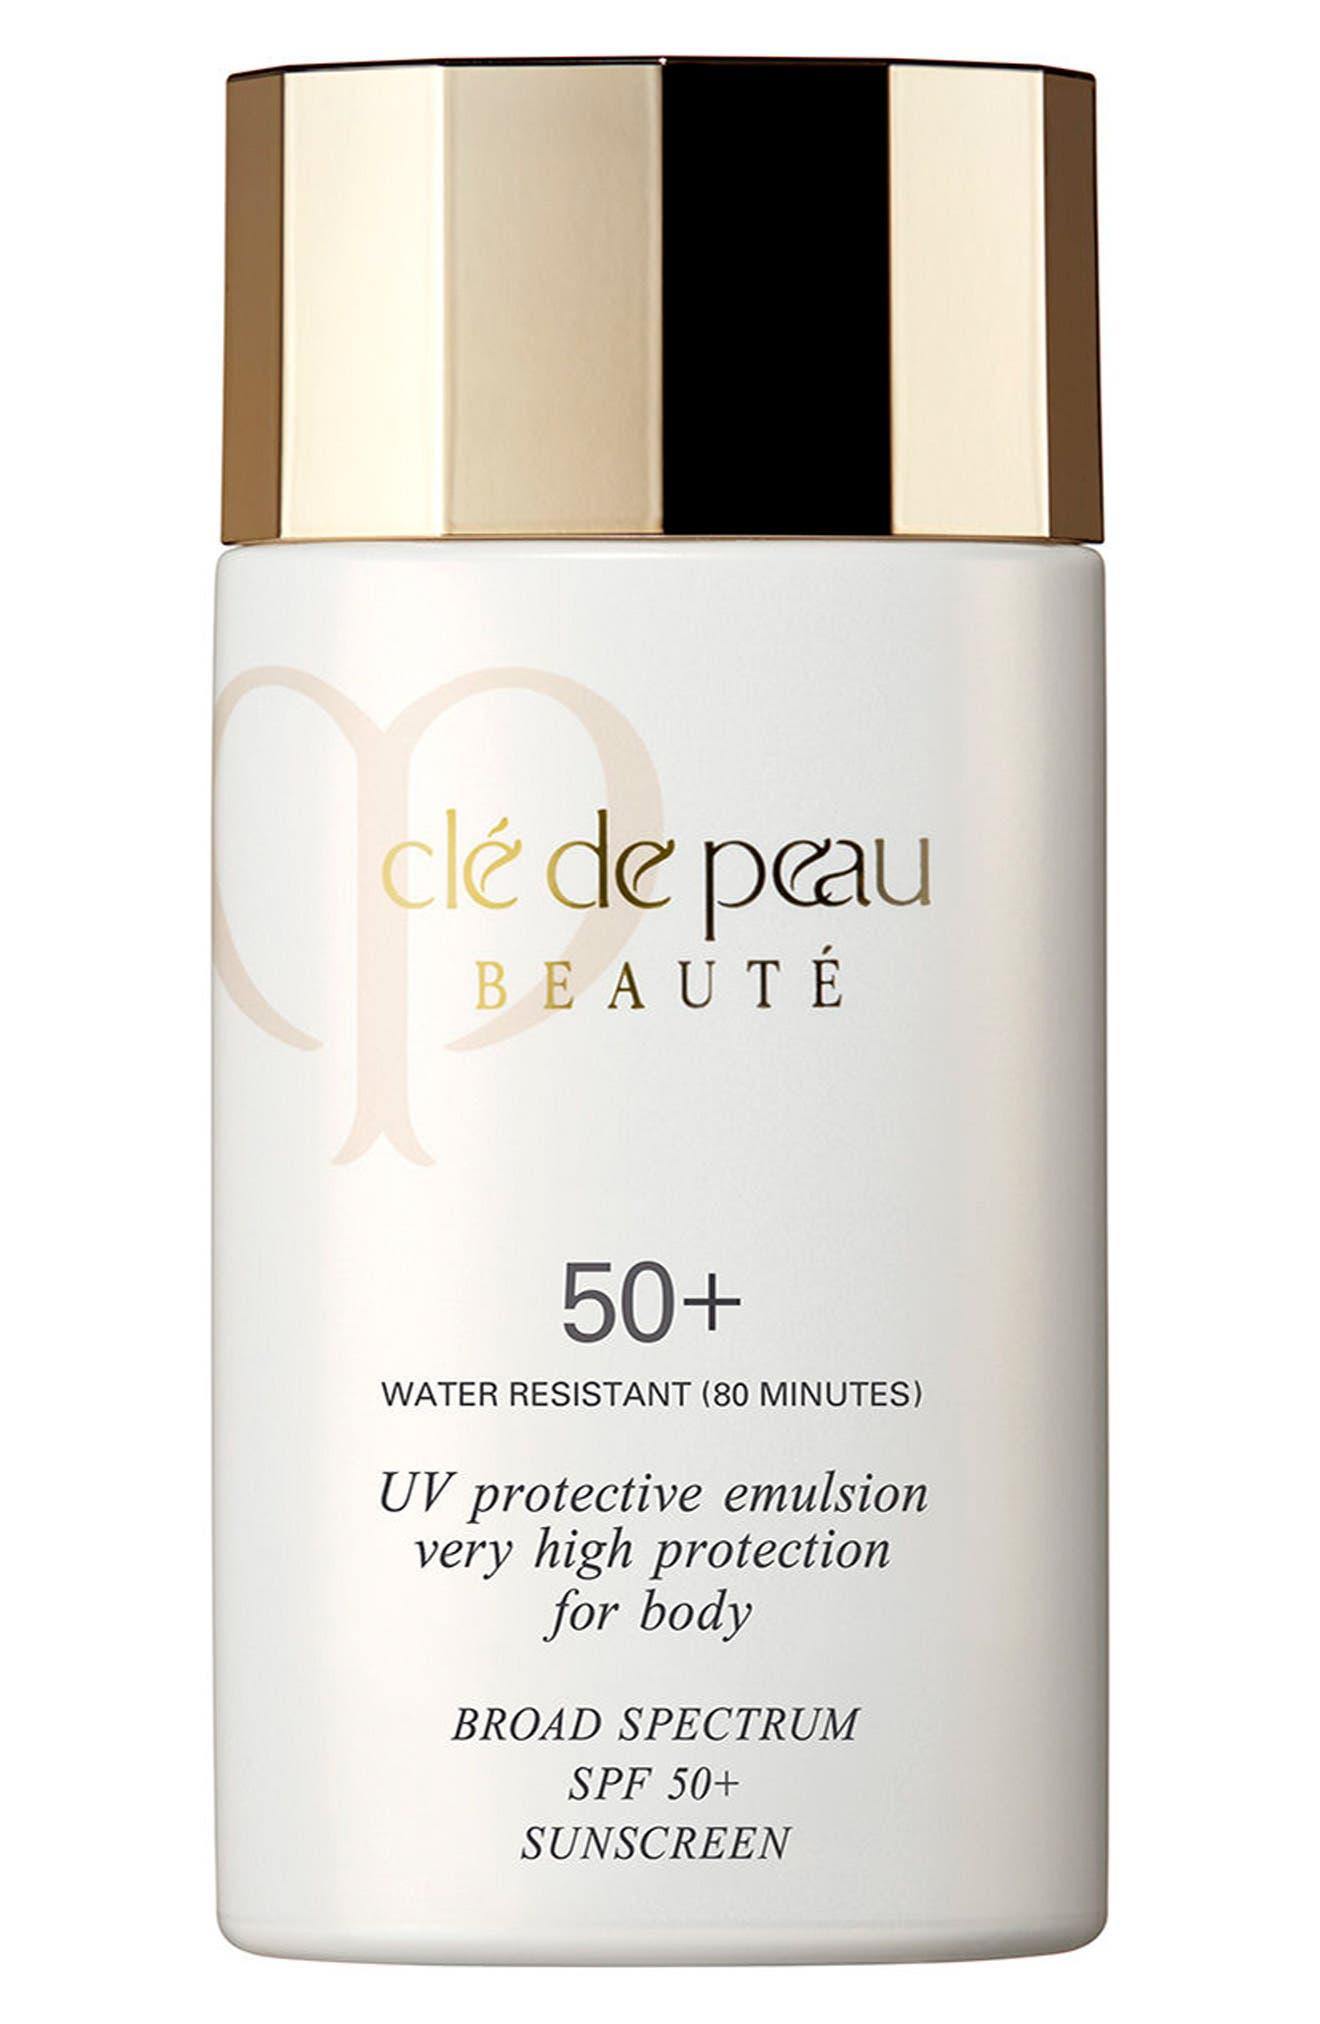 Main Image - Clé de Peau Beauté UV Protective Emulsion Very High Protection for Body Broad Spectrum SPF 50+